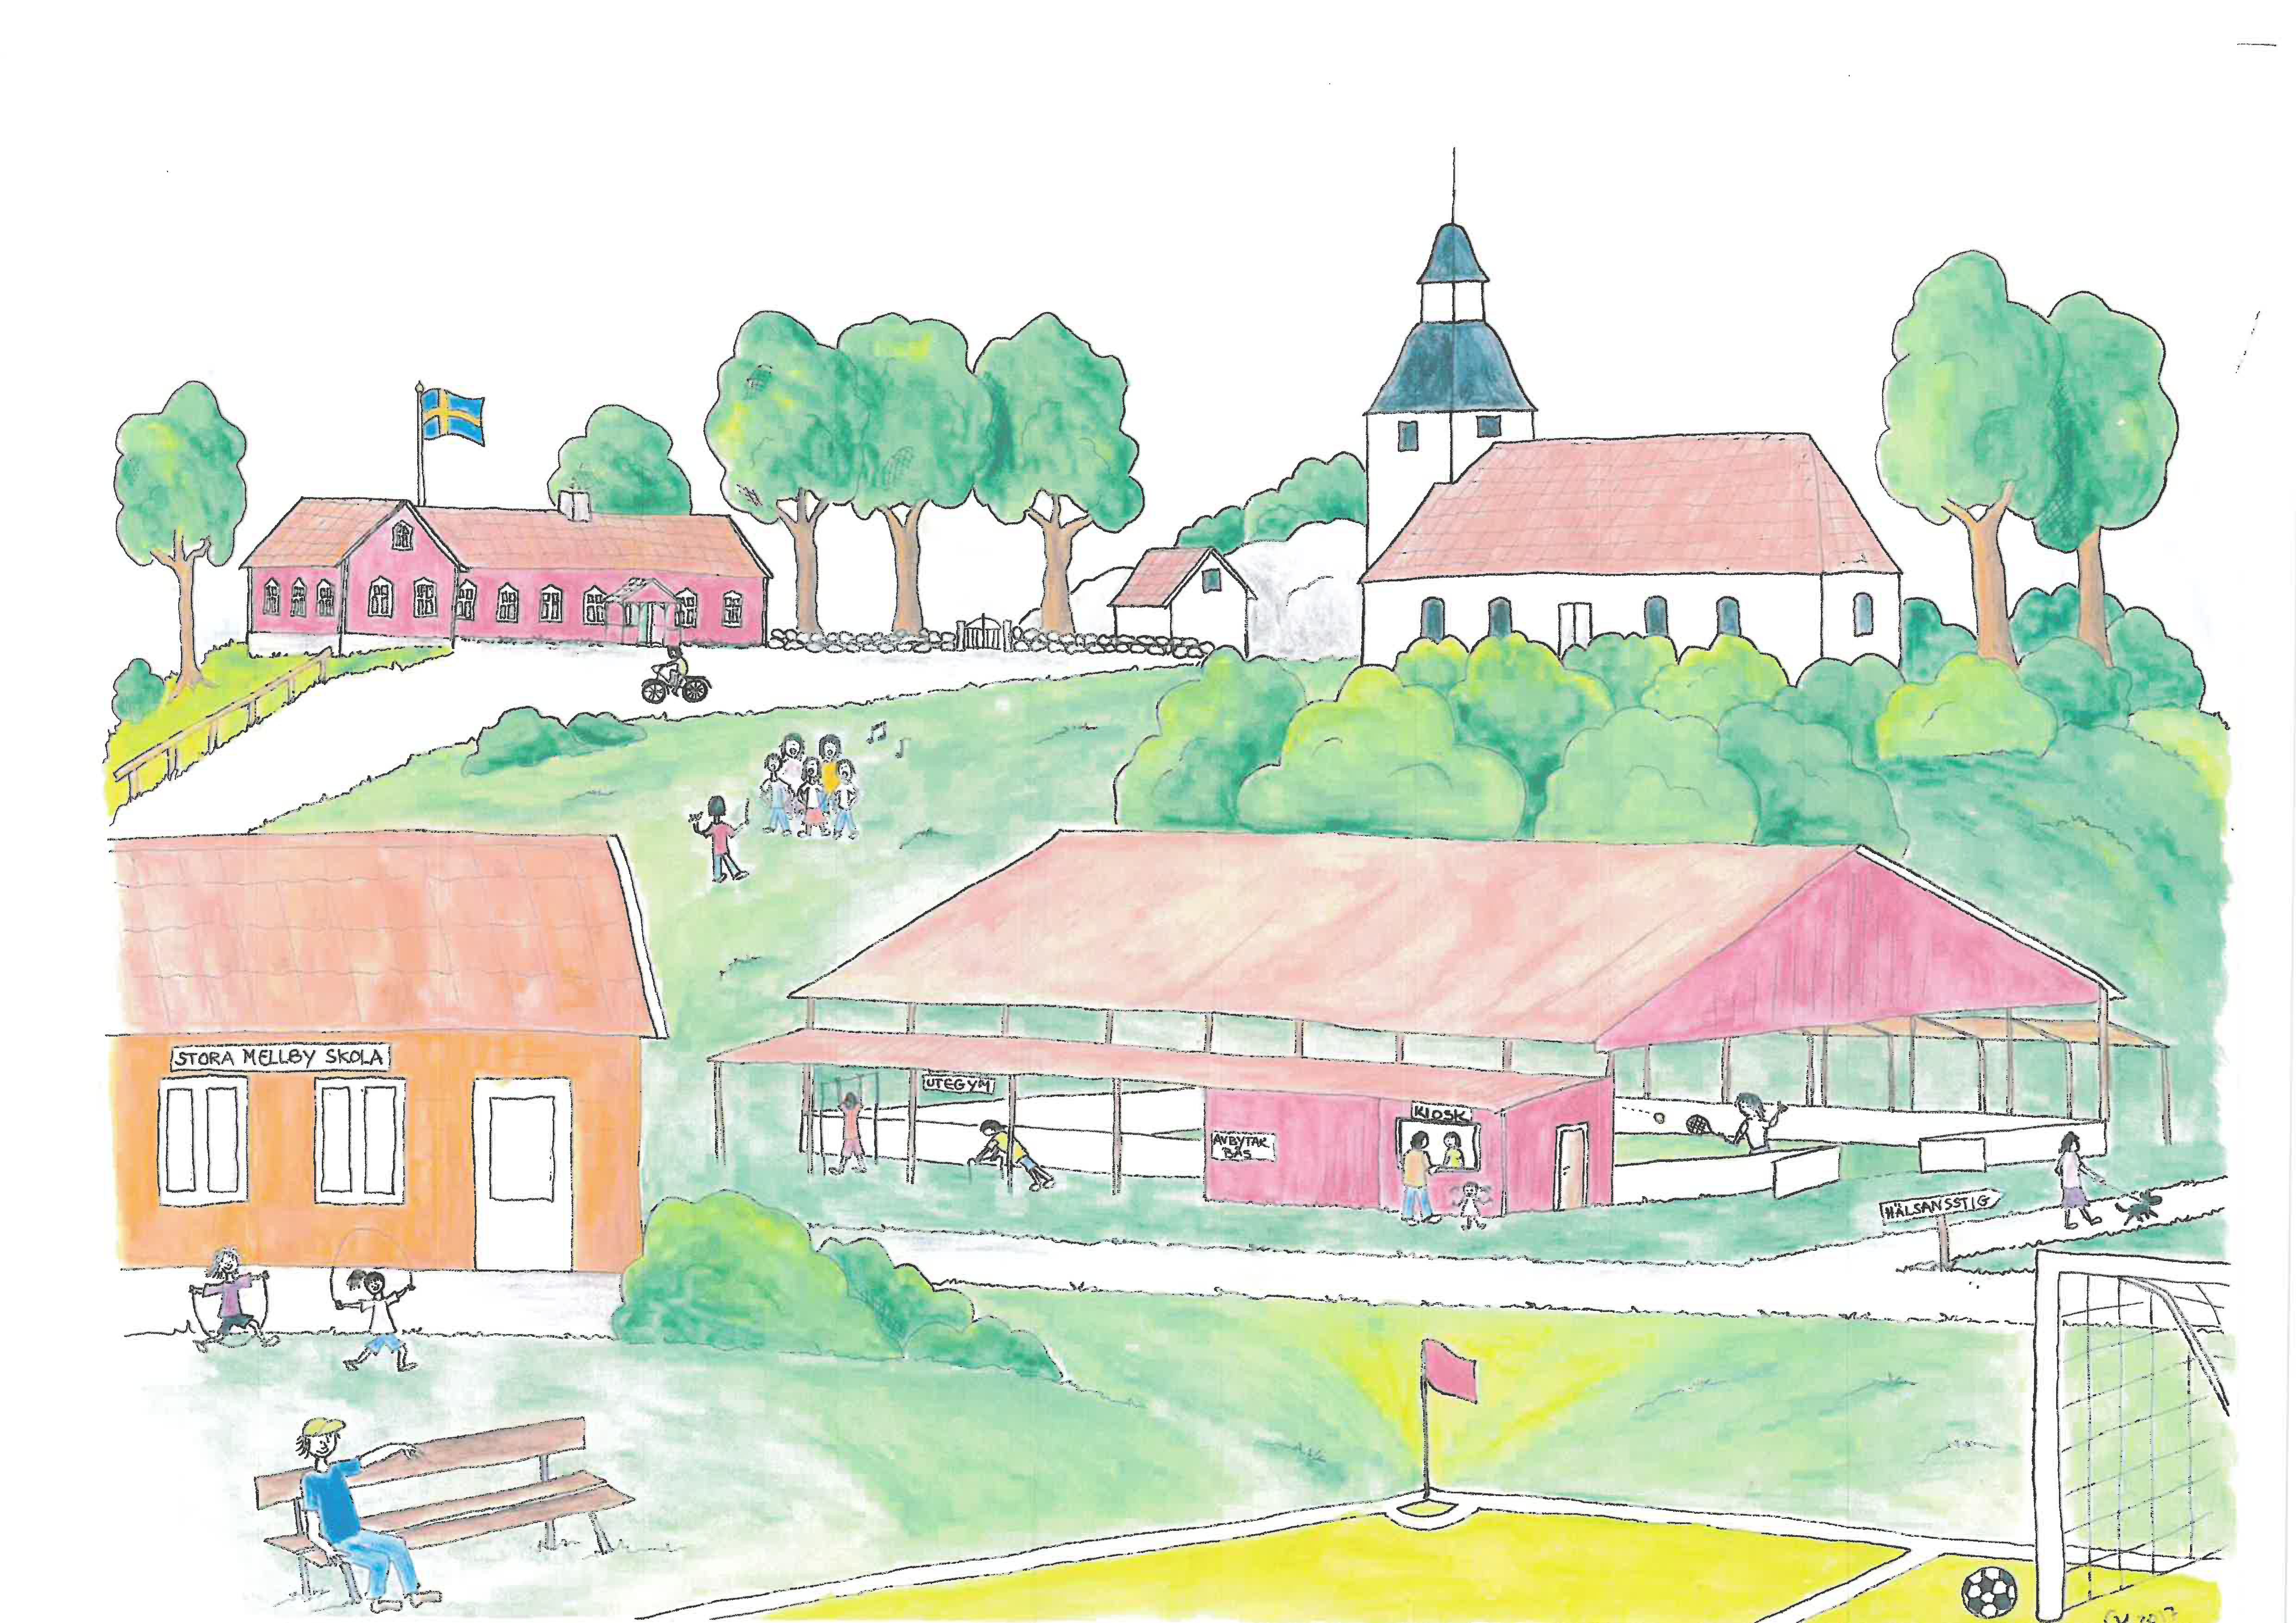 ppen verksamhet i Alingss | patient-survey.net